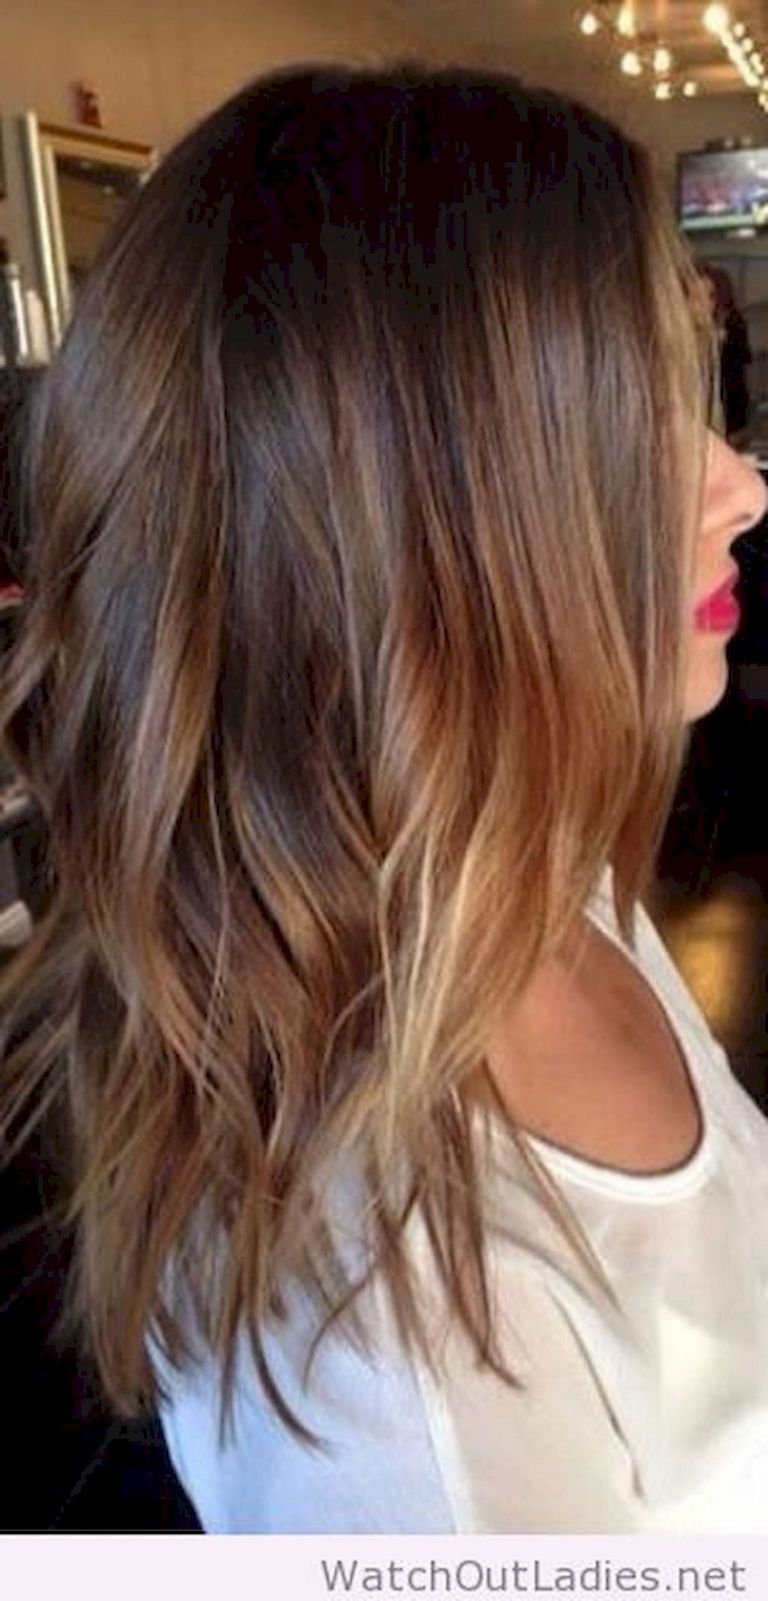 Gorgeous 101 beautiful hair color ideas for brunettes https gorgeous 101 beautiful hair color ideas for brunettes httpsbitecloth pmusecretfo Images